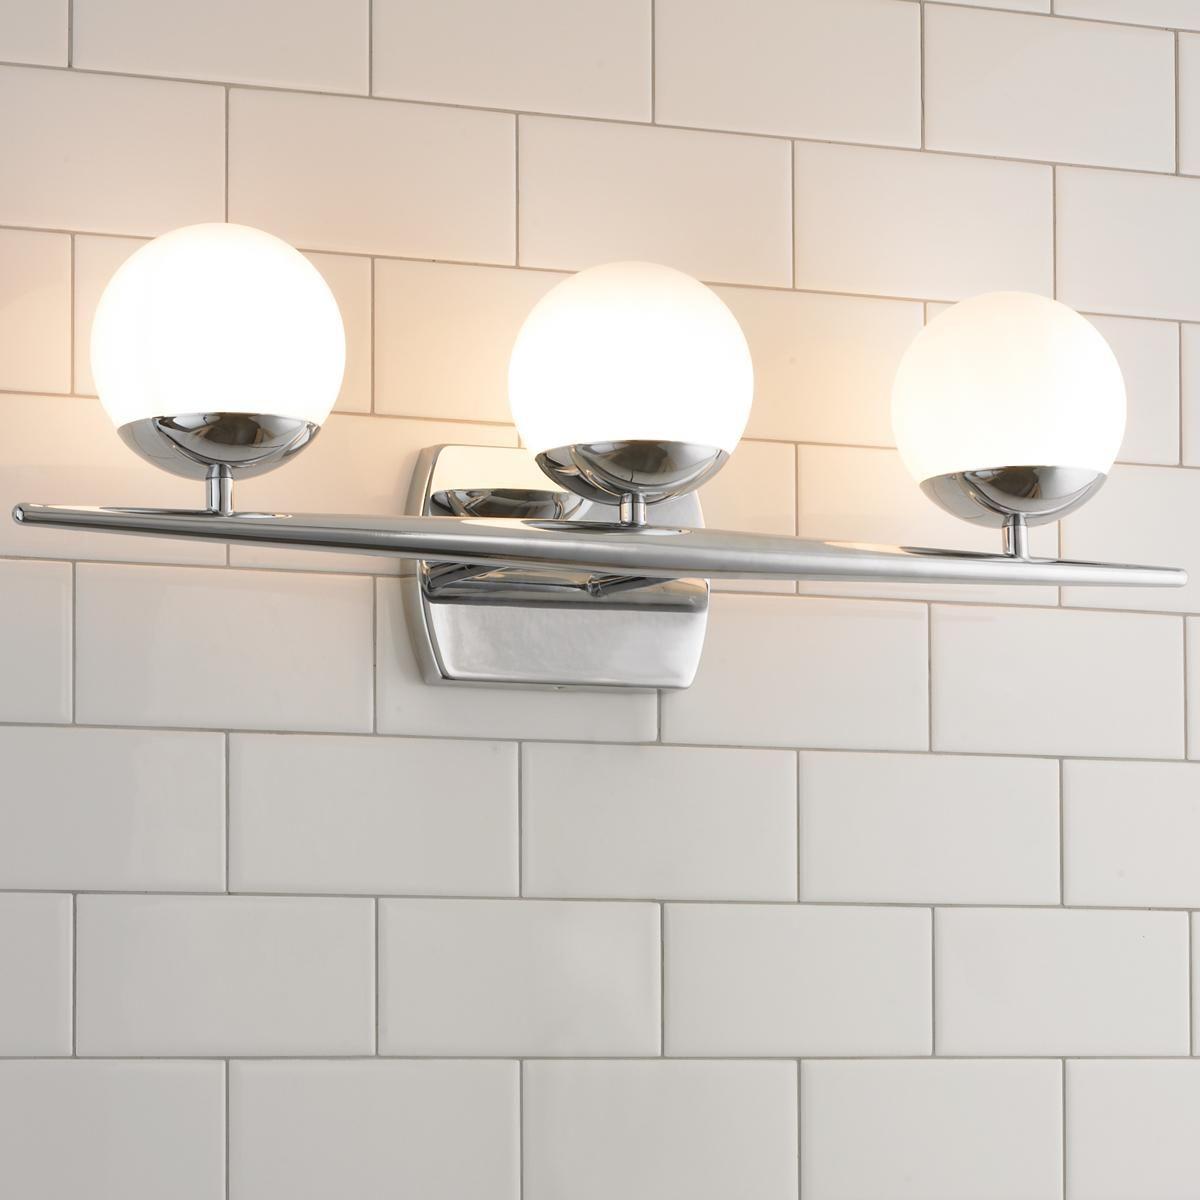 Linear Globe Bath Light 3 Light Bathroom Light Fixtures Contemporary Bathroom Lighting Bath Light